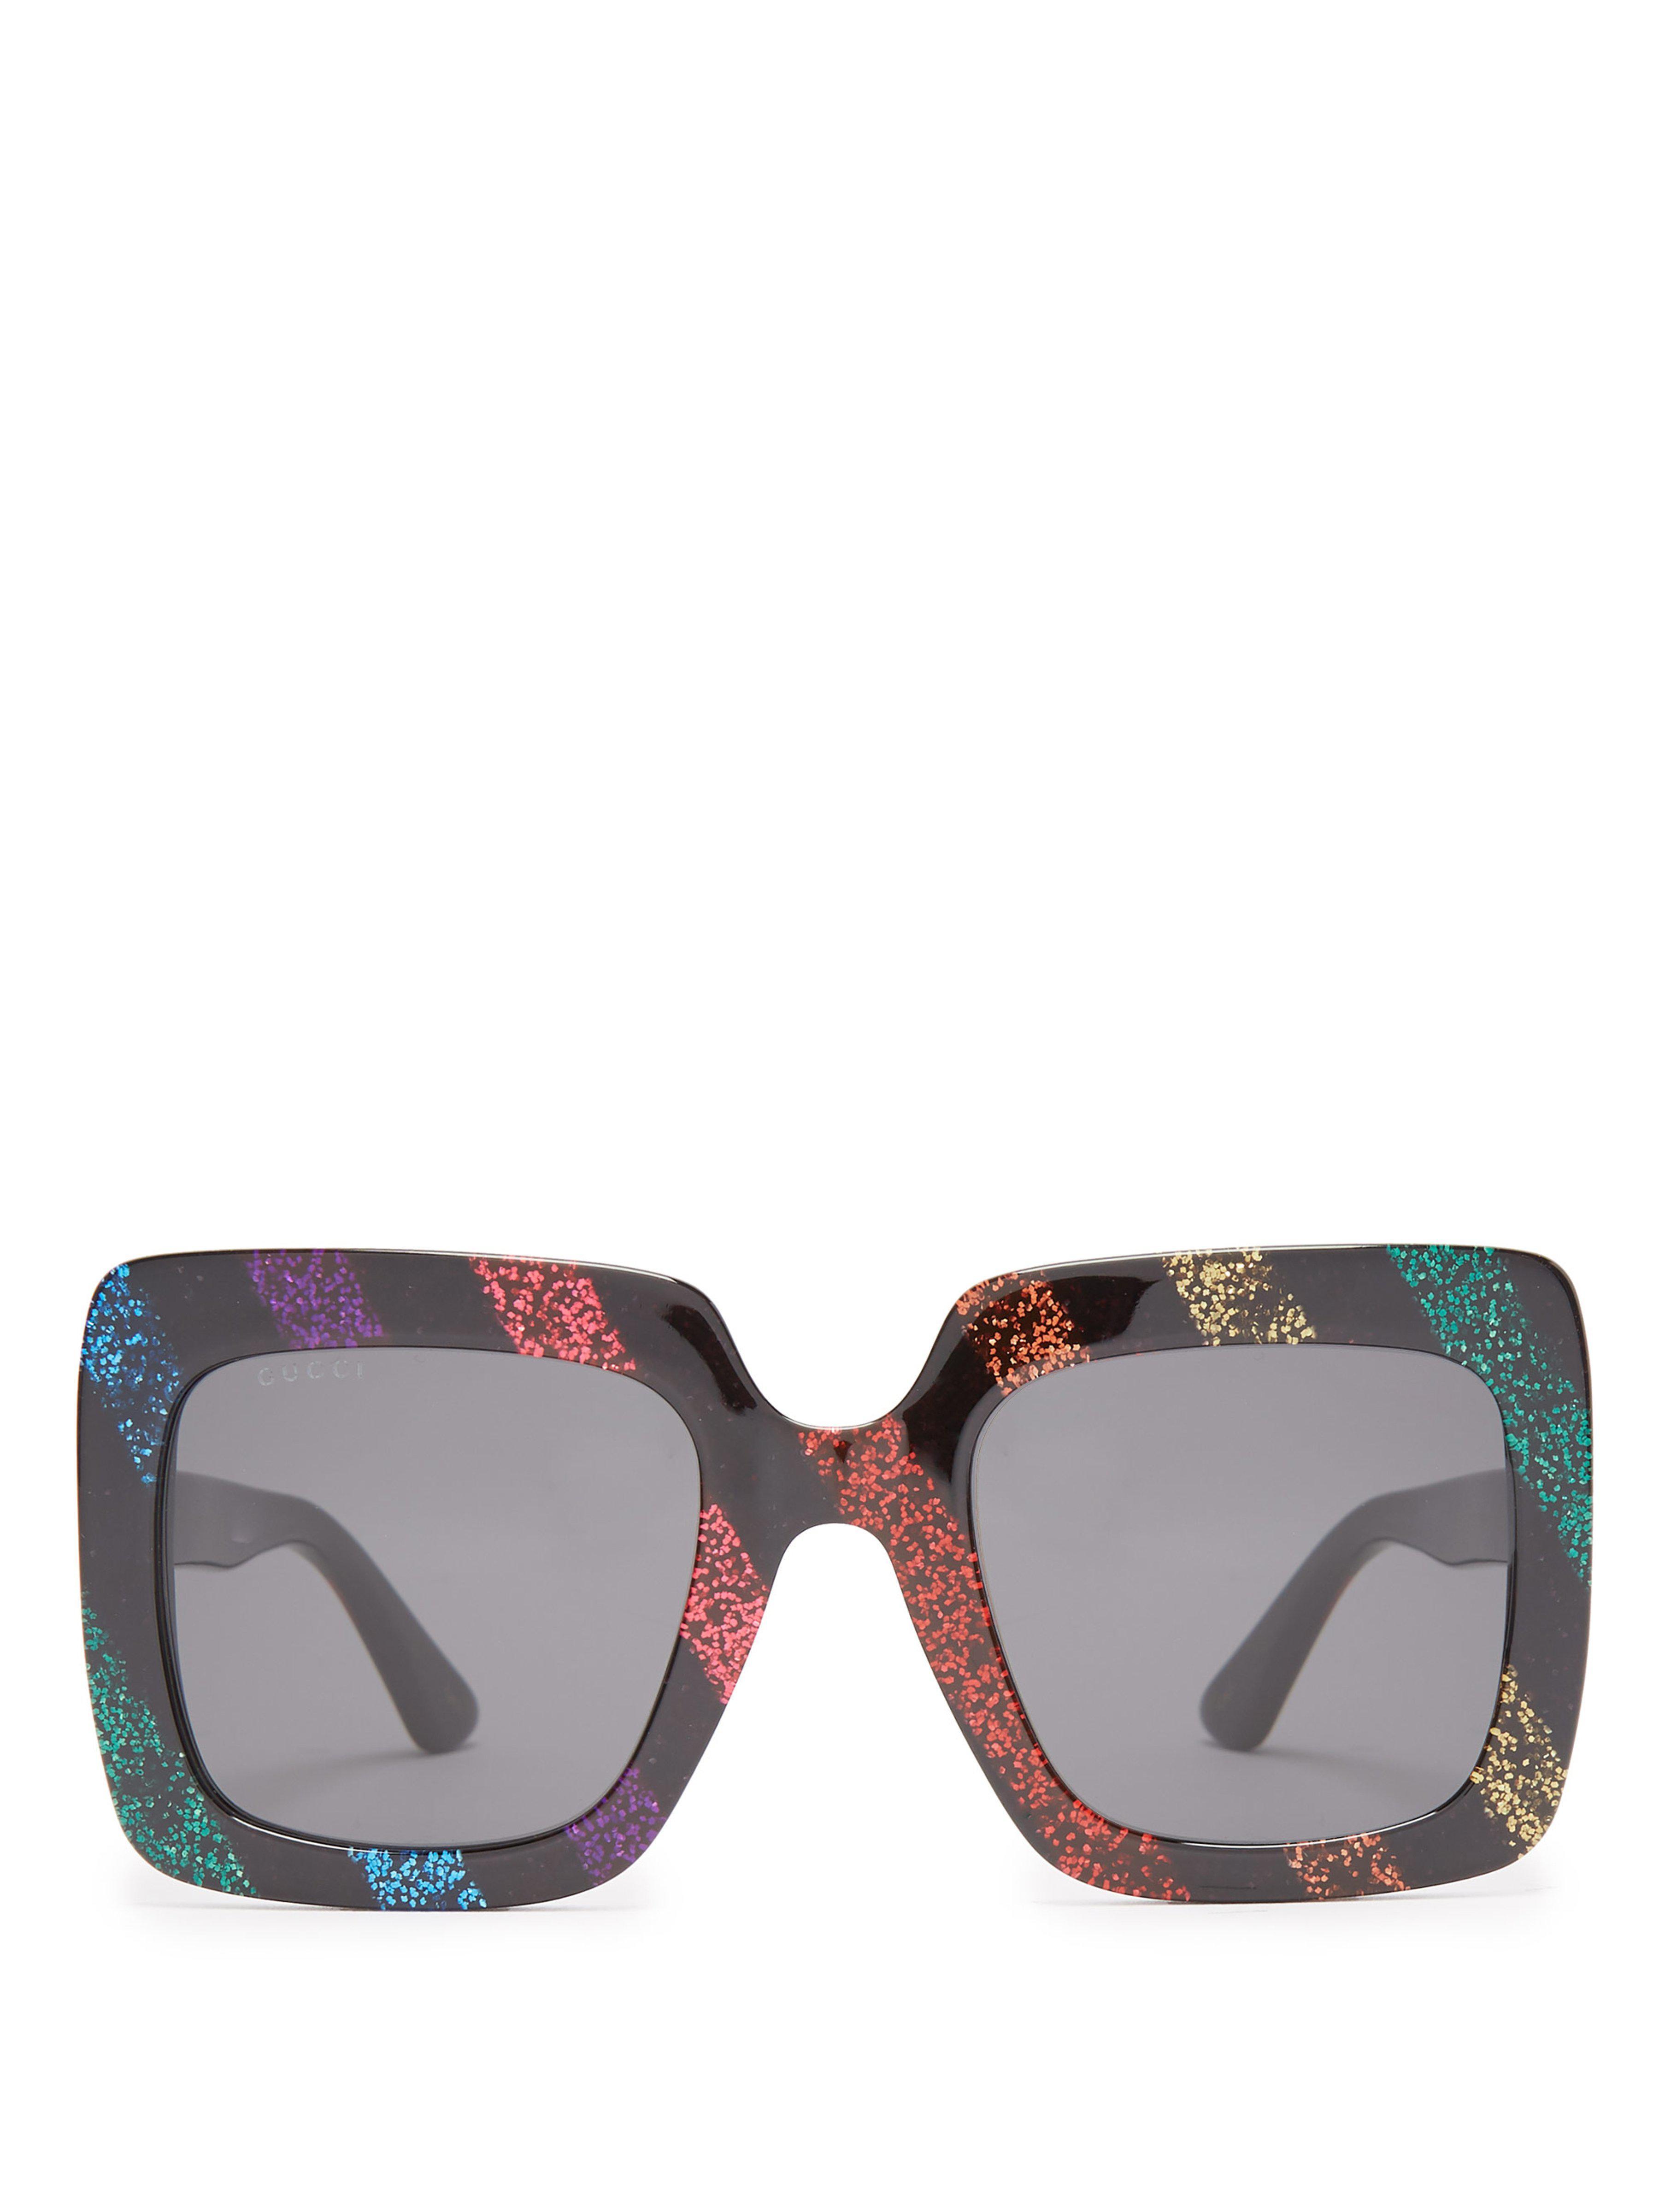 8c34fc3f3e Gucci Square Frame Glitter Acetate Sunglasses - Save 4% - Lyst